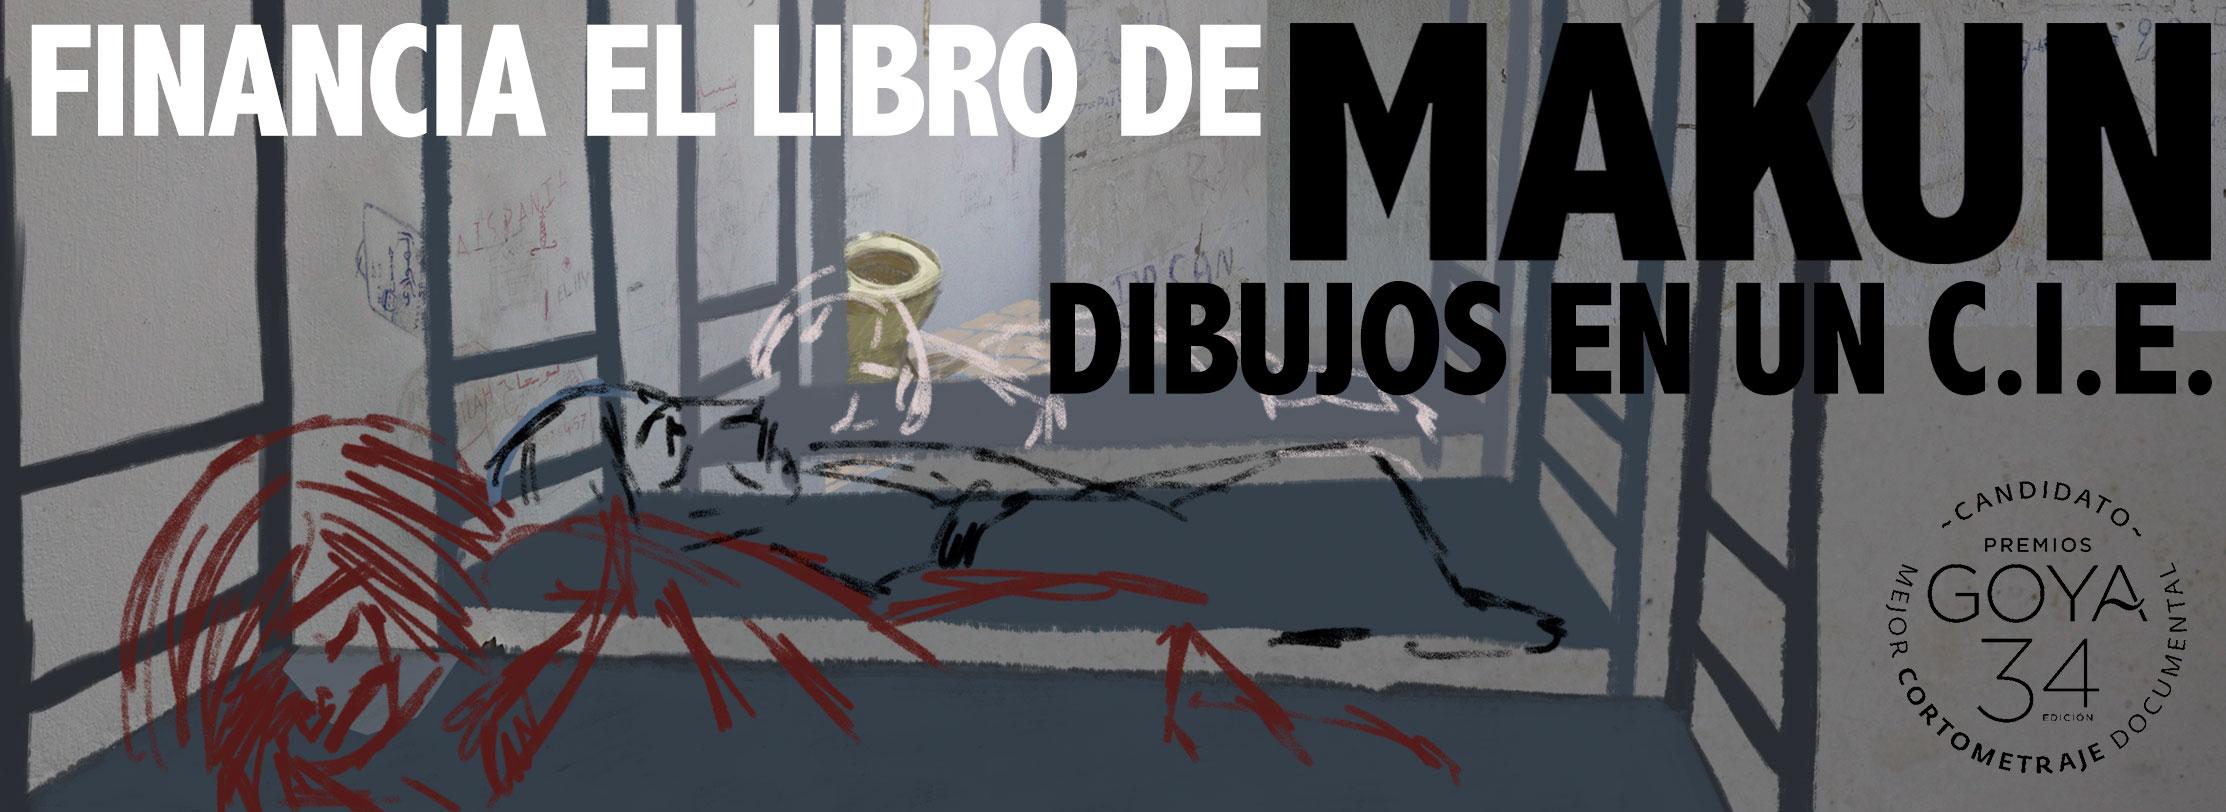 banner-MAKUN-libro.jpg